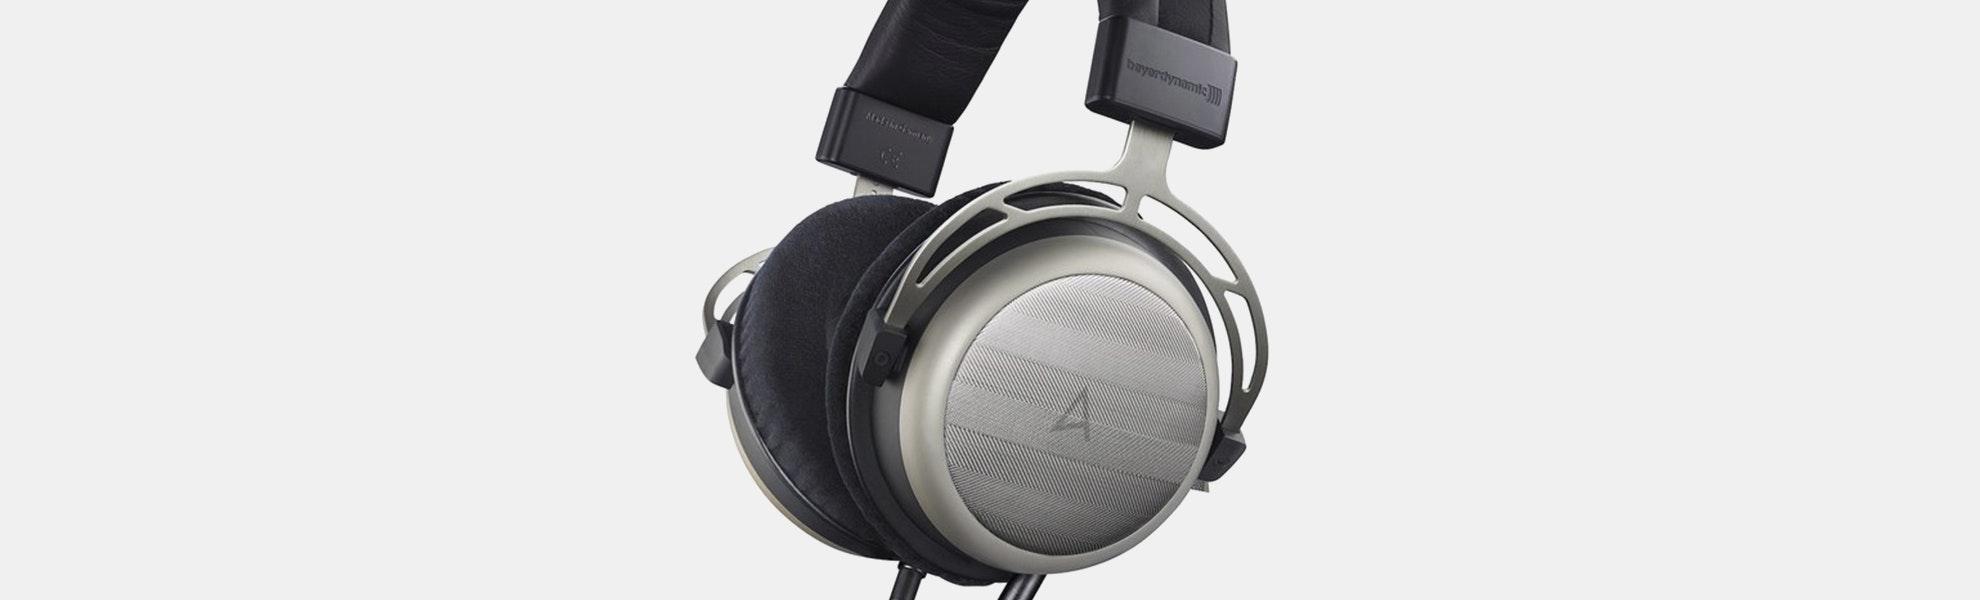 Astell&Kern Beyerdynamic AK T1p Headphones